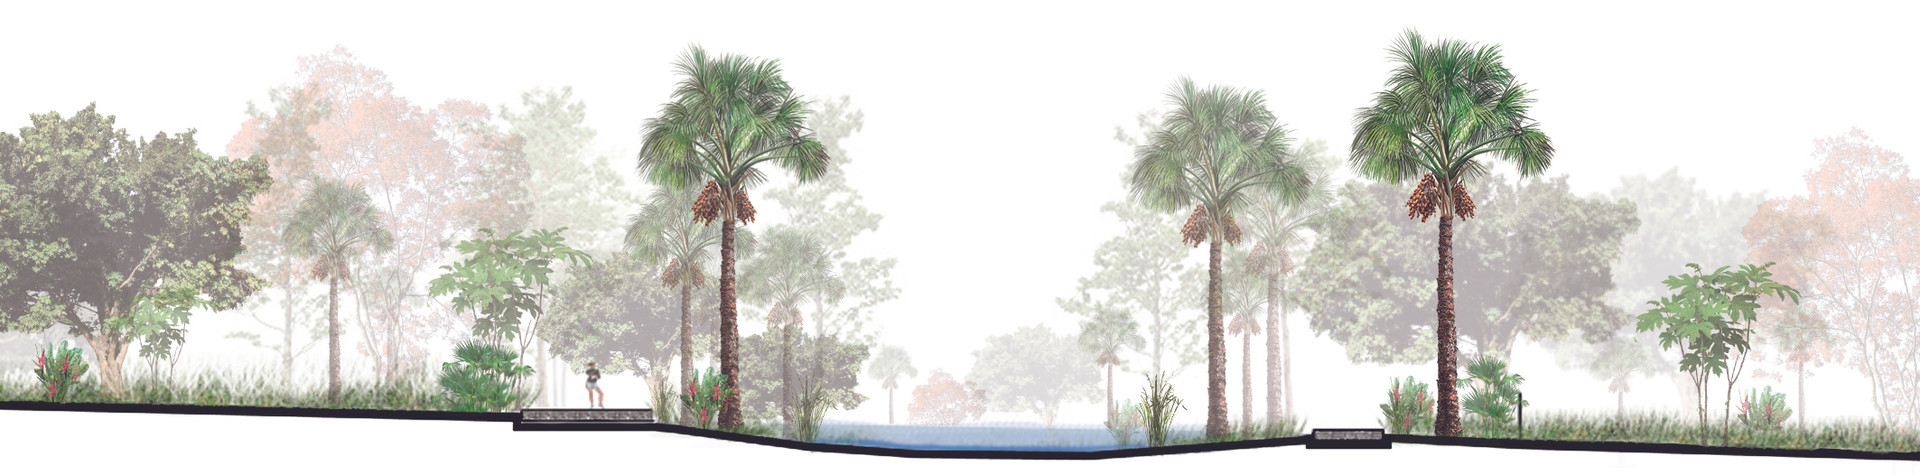 200912 Zoom Jardin de lluvia.jpg